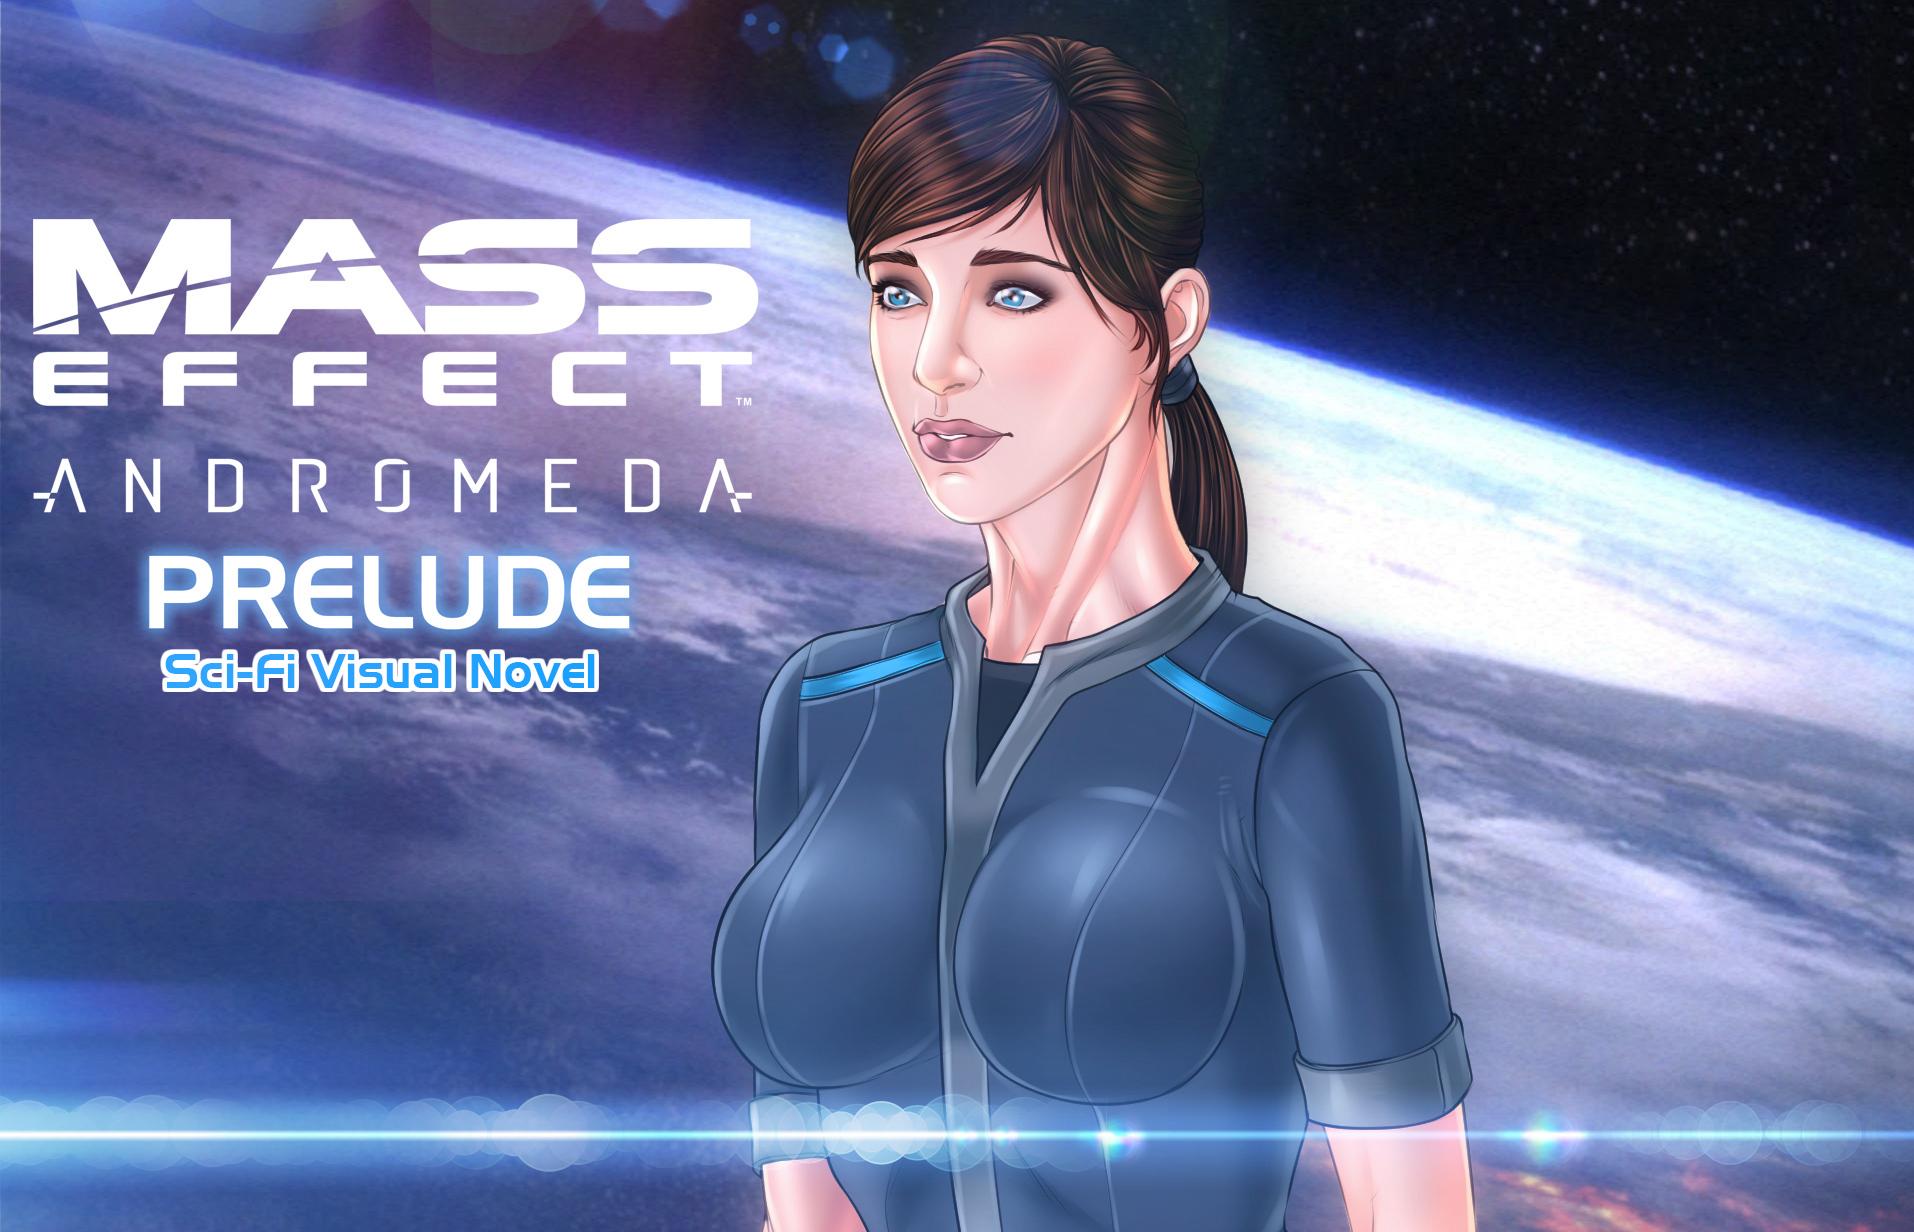 Andromeda Prelude